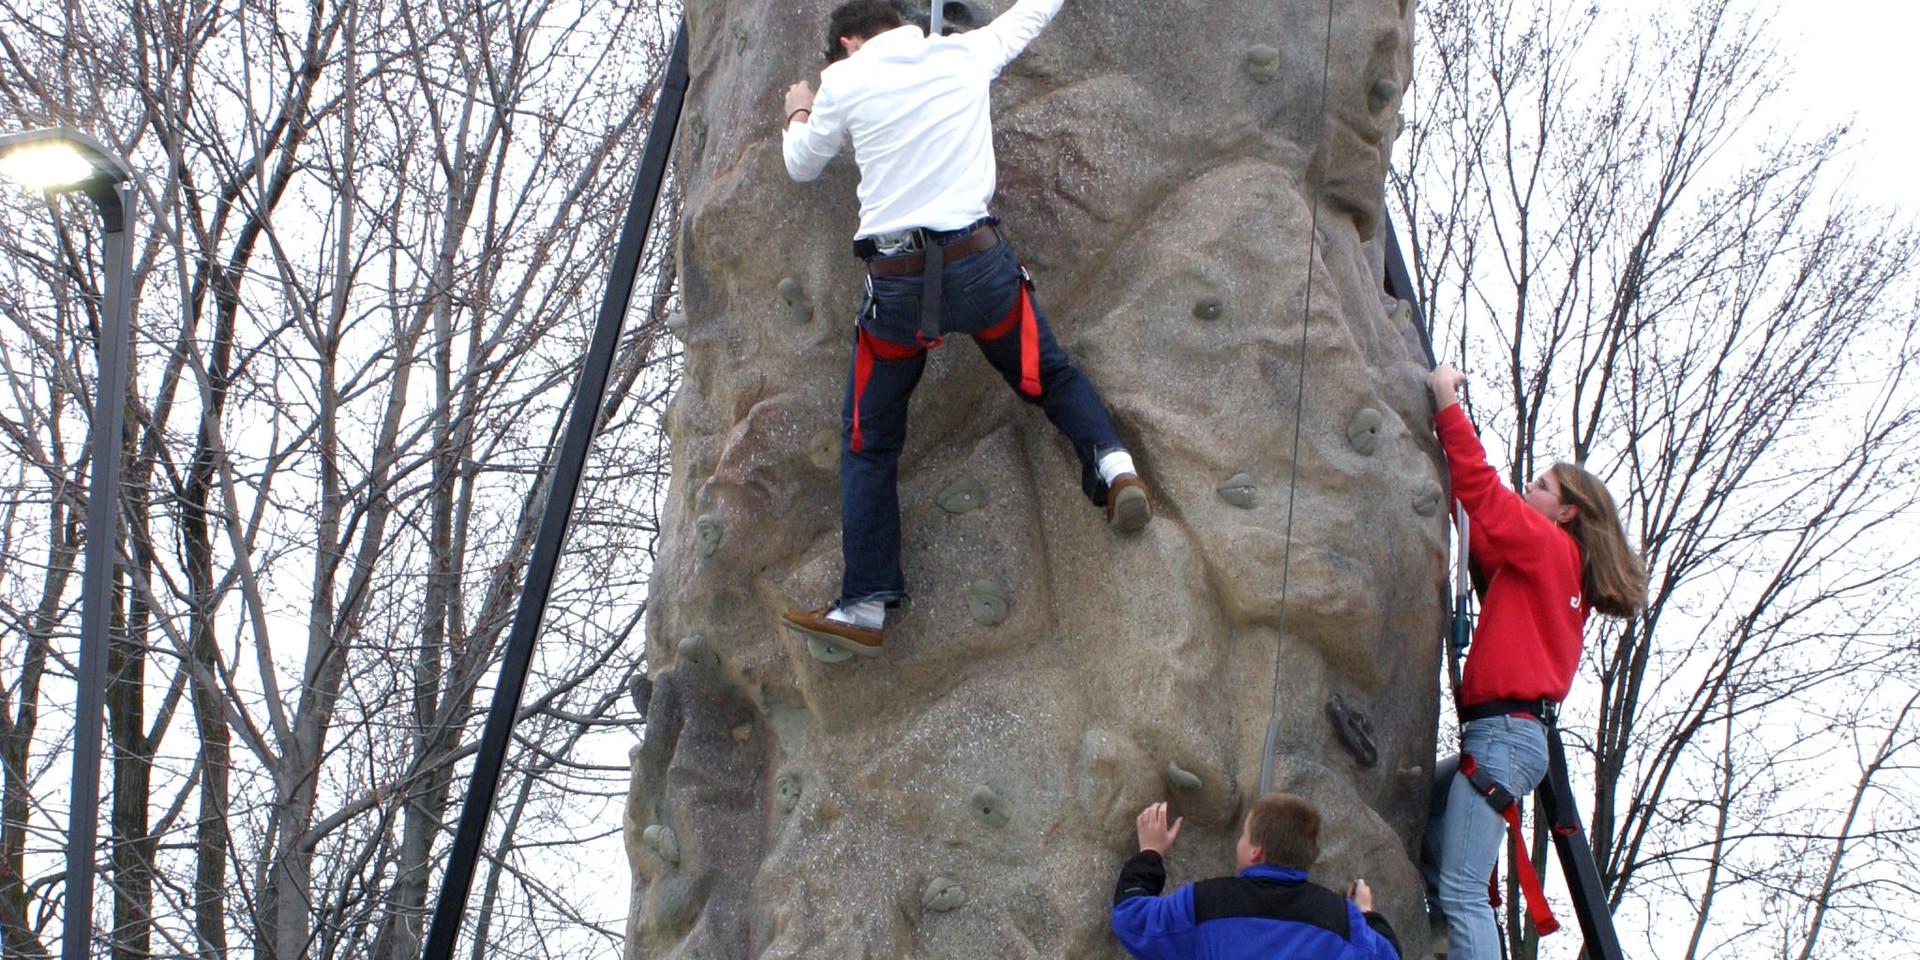 kids on Climbing Wall